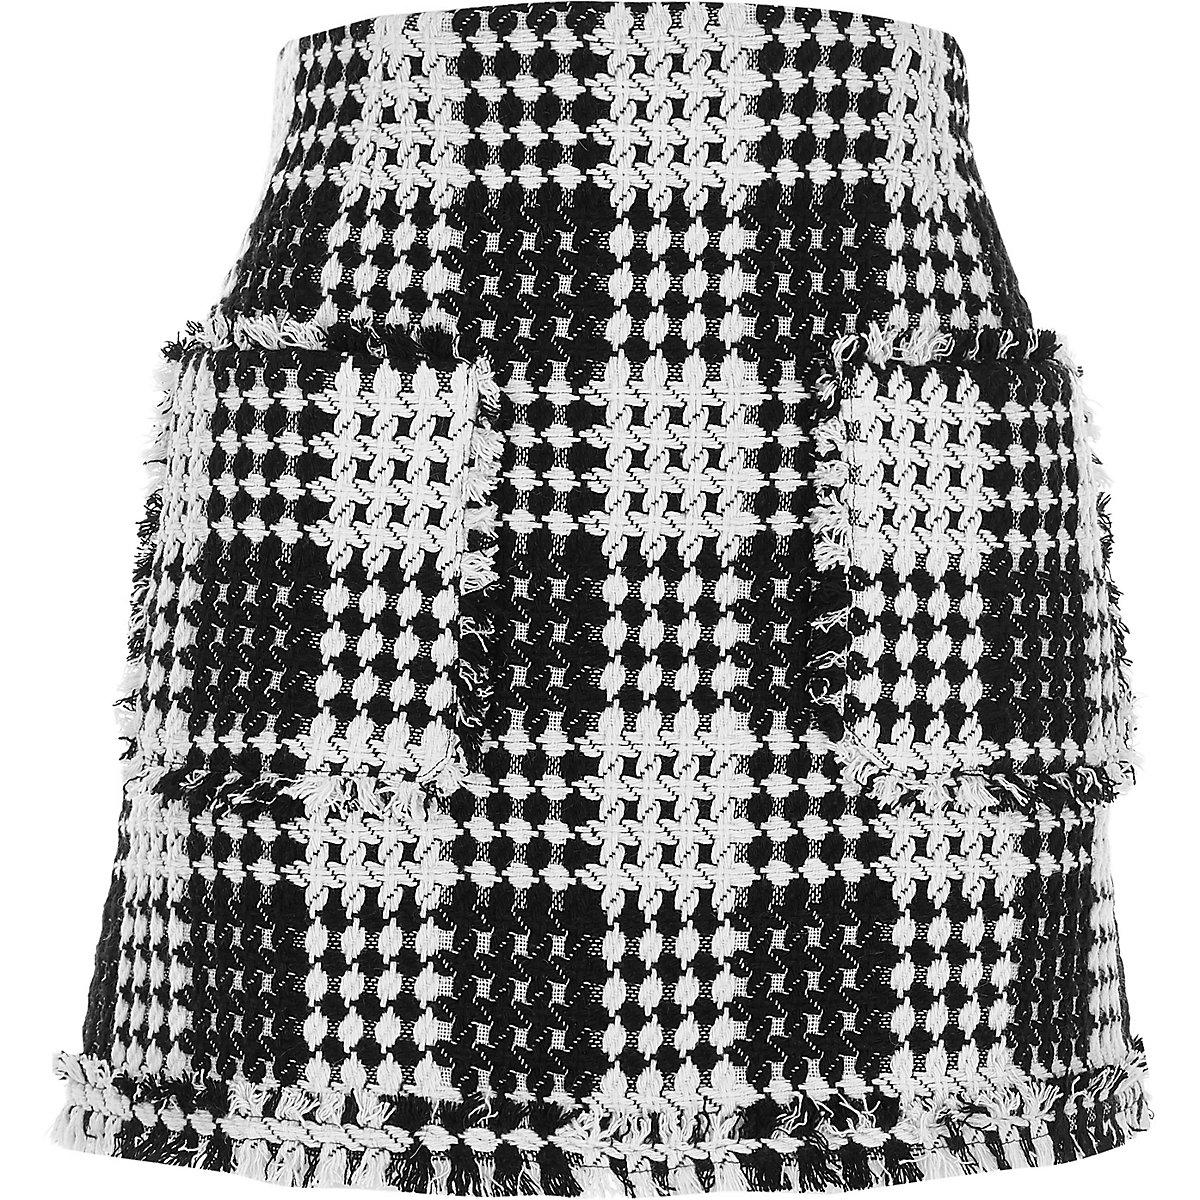 Black and white woven knit mini skirt